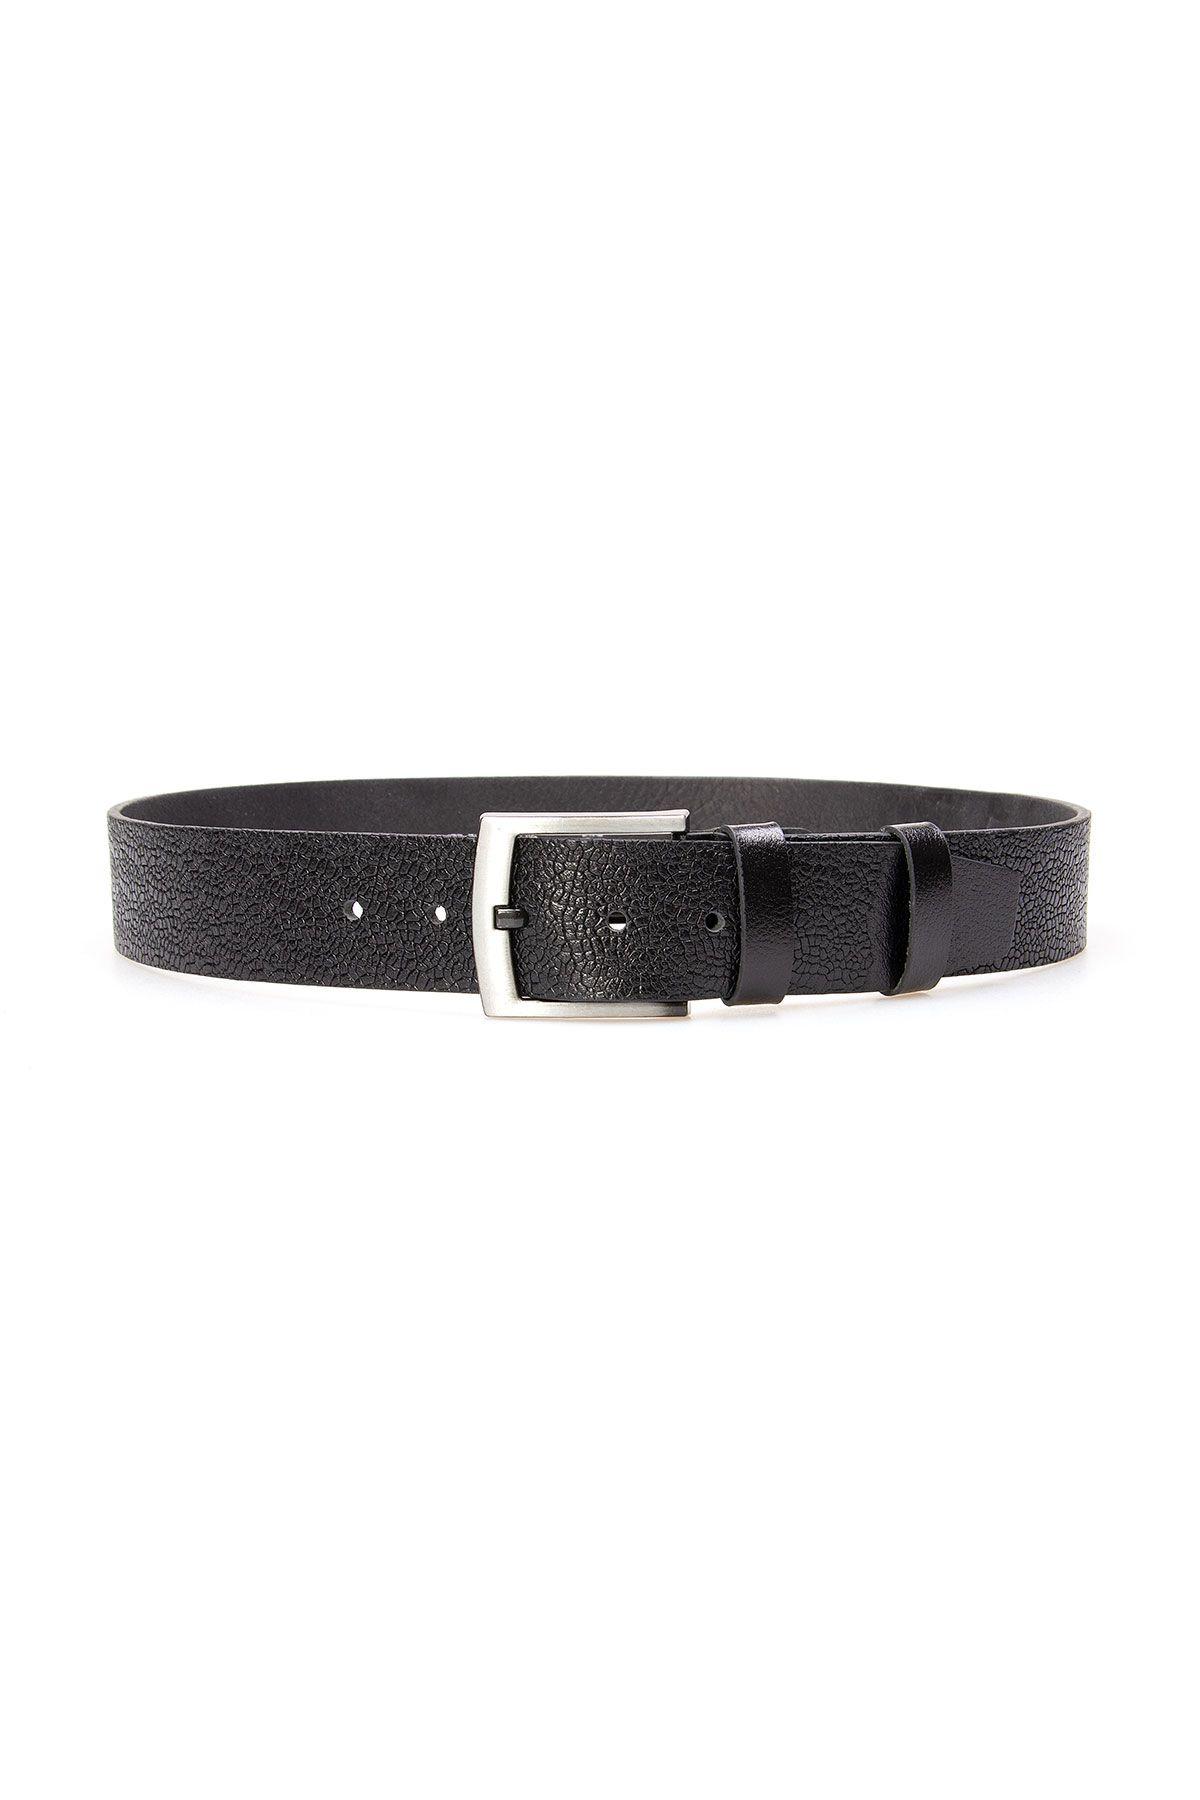 Pegia Men's Genuine Leather Belt 19KMR06 Black